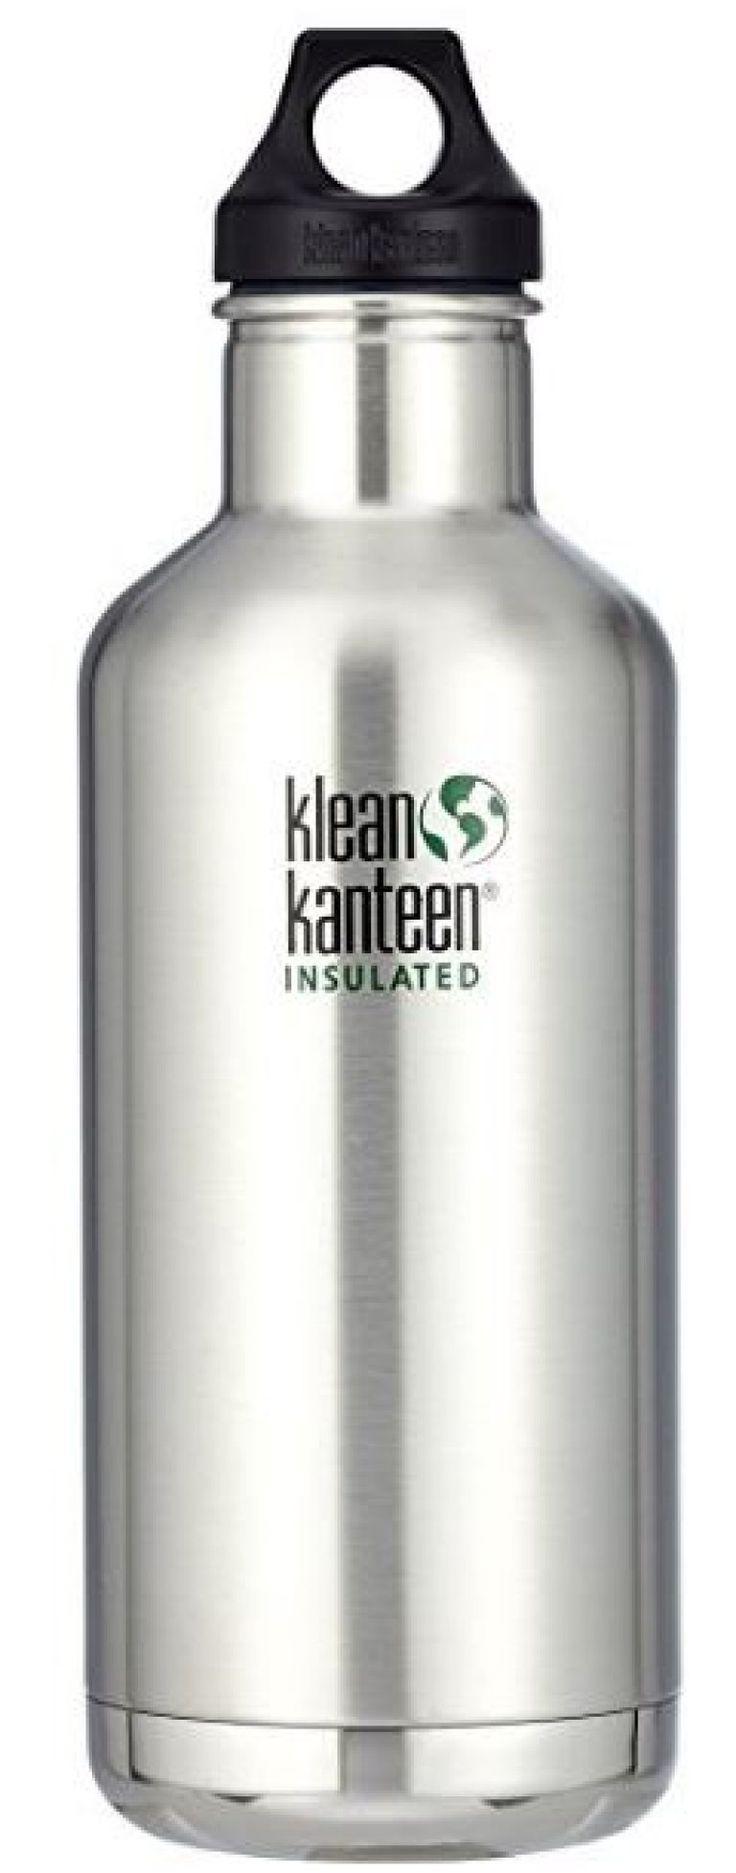 Klean Kanteen Insulated Classic 20oz